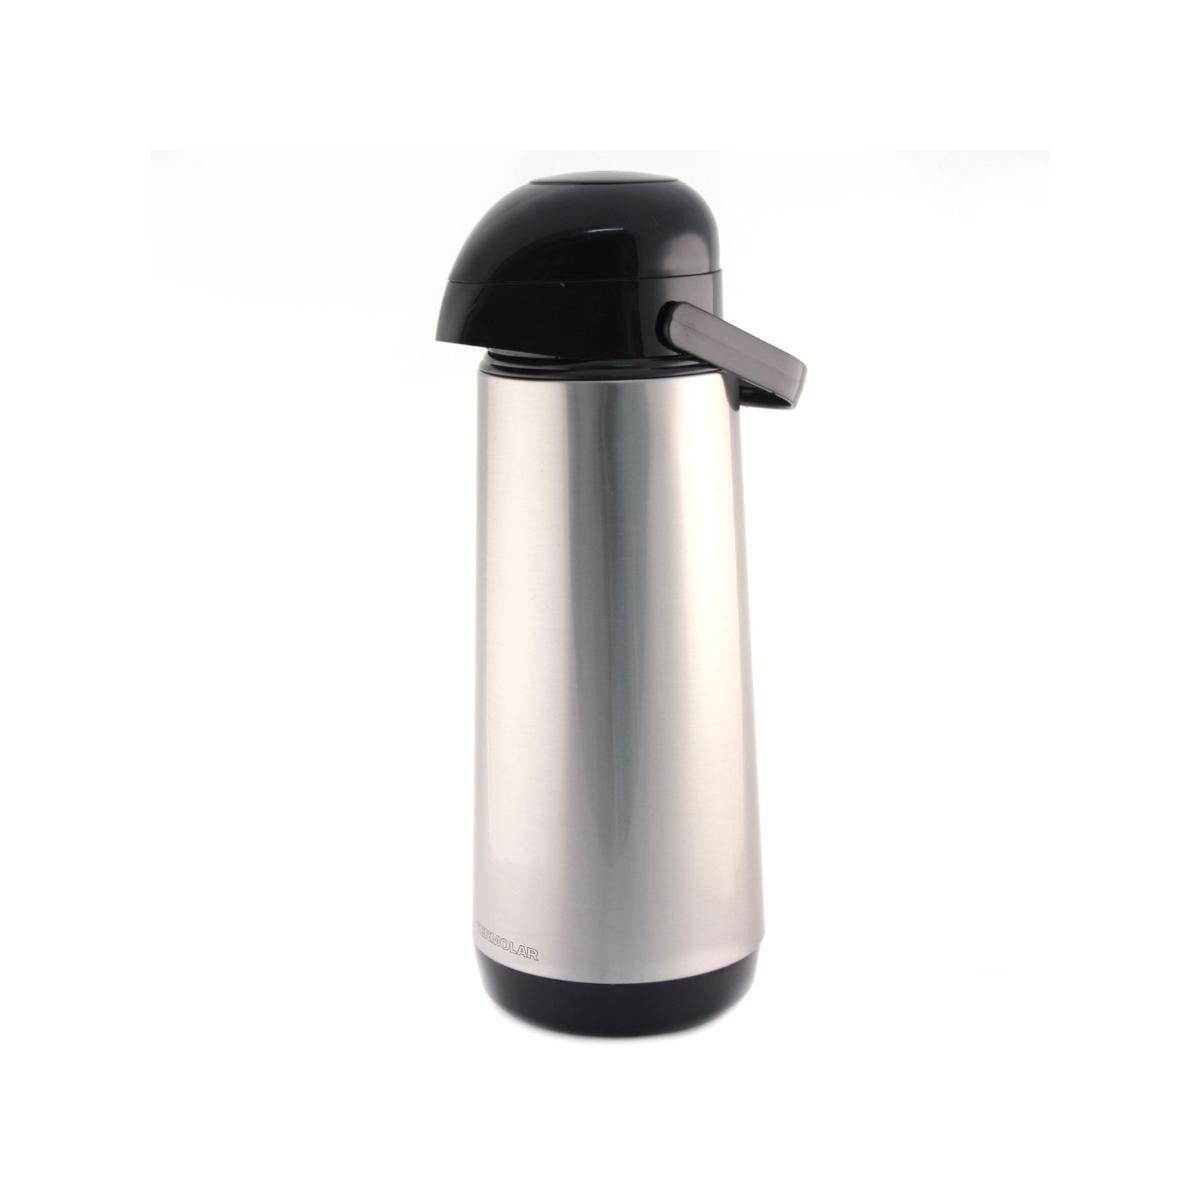 Garrafa Térmica Lúmina 9751 Termolar - 1 Litro - Aço Inox